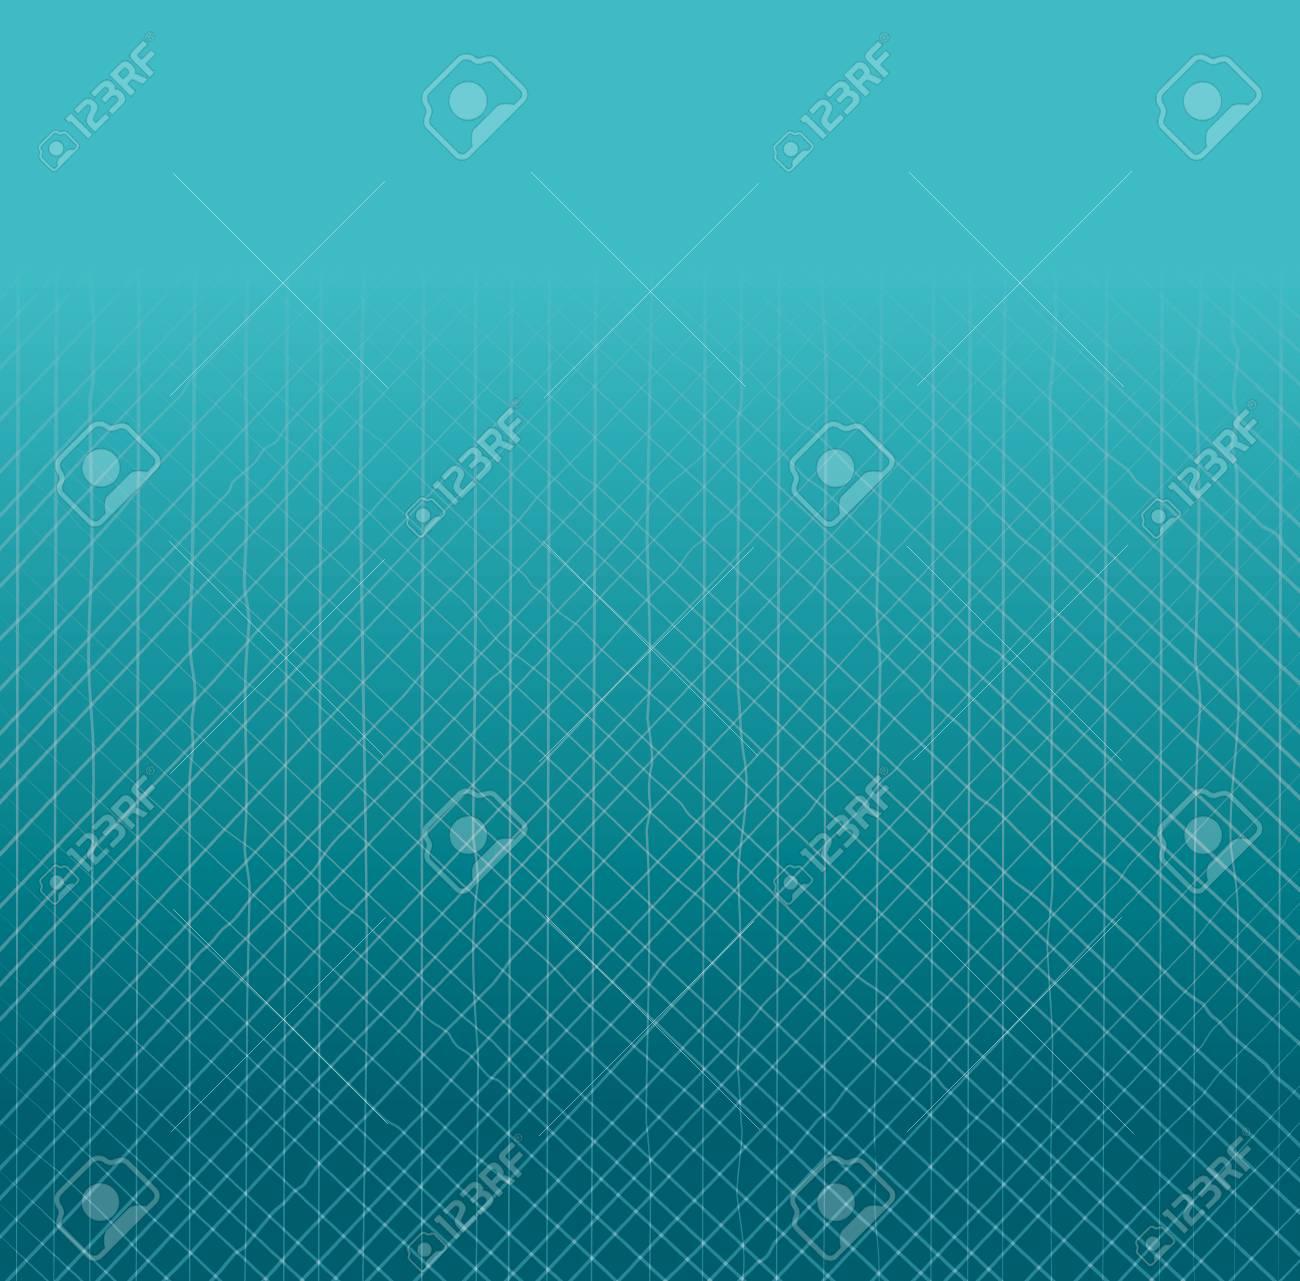 Geometric figures with blue background vector illustration design. - 98475107